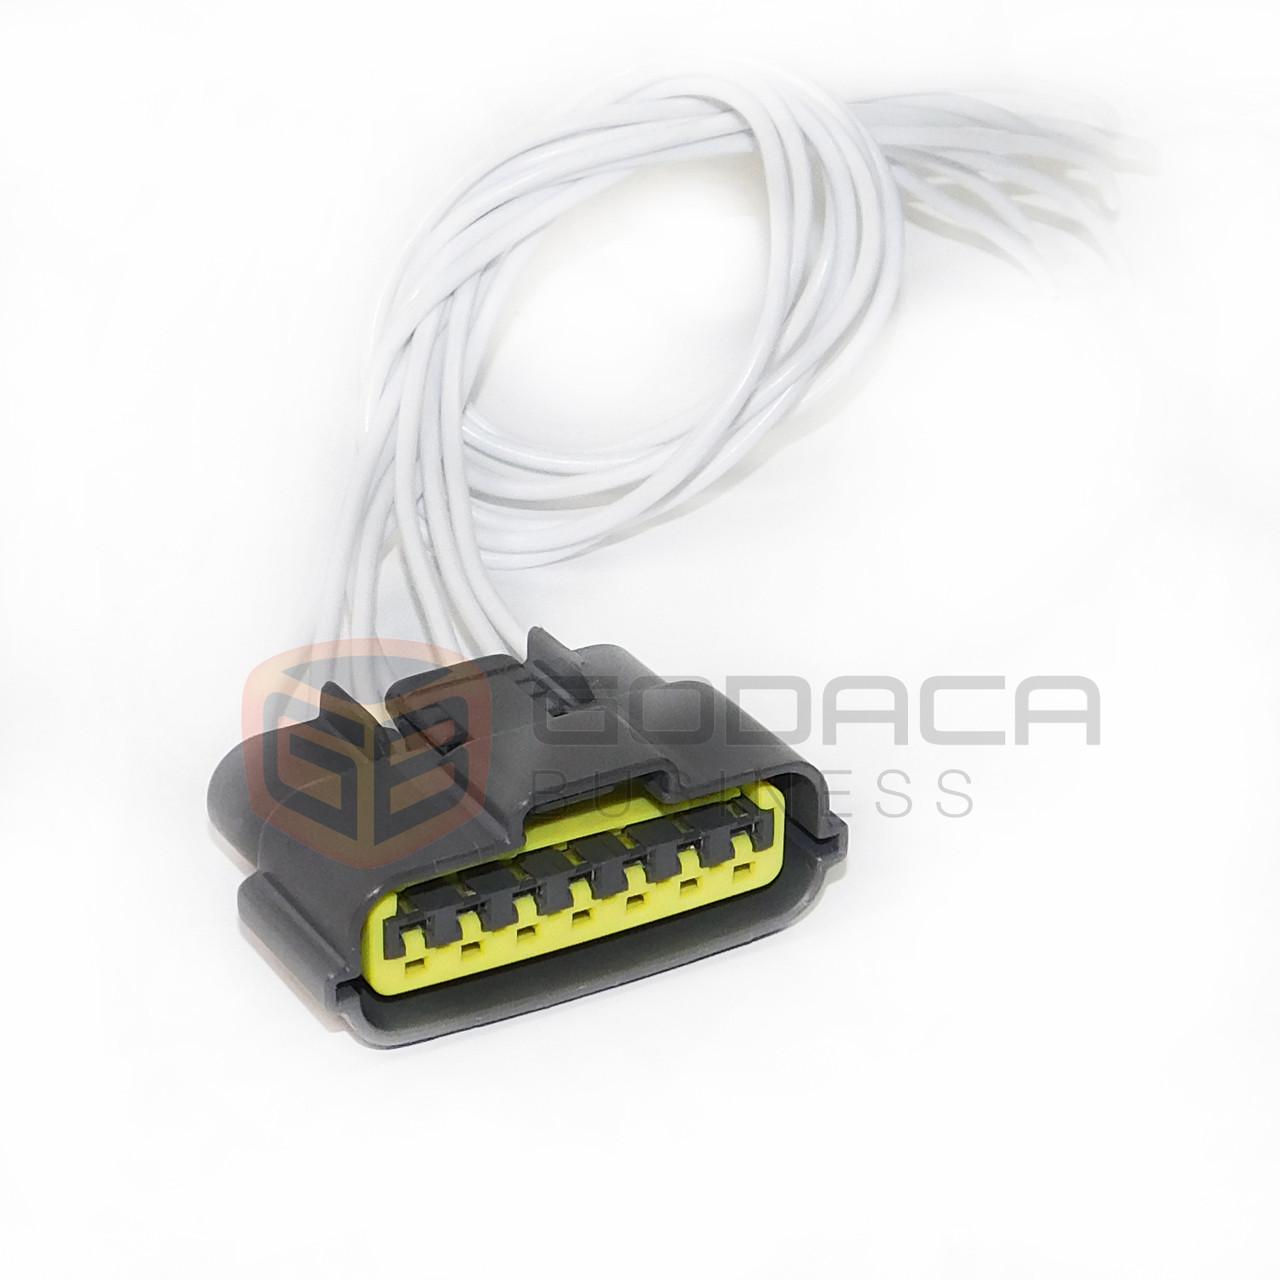 1x 7-way repair connector pigtail for nissan infiniti igniter coil loom  side - godaca, llc